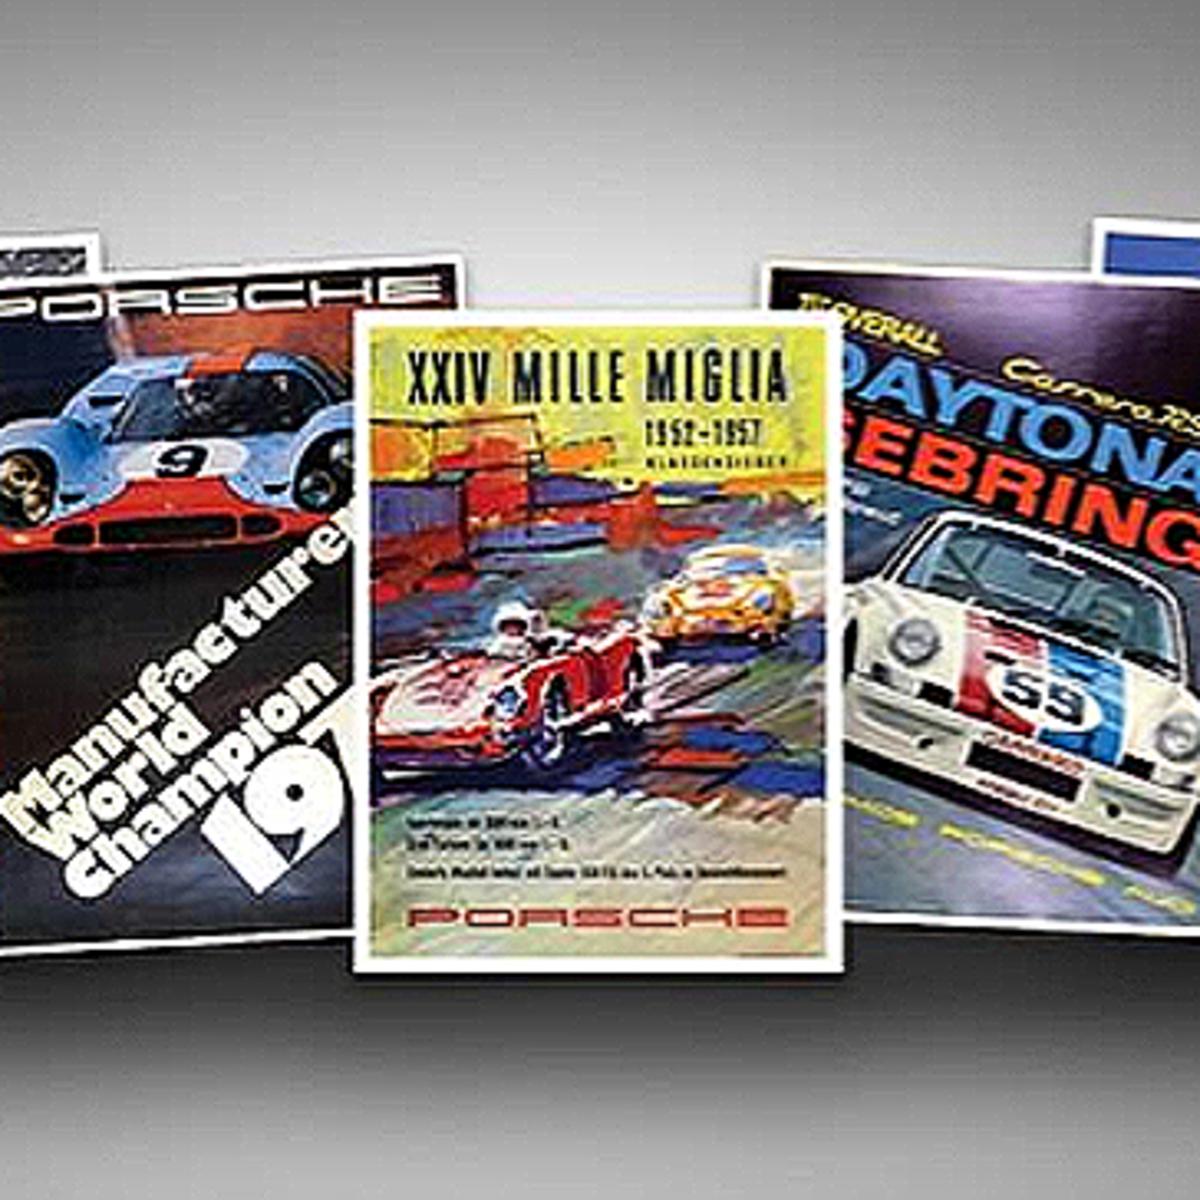 Porsche 1971 World Championship Vintage Race Poster